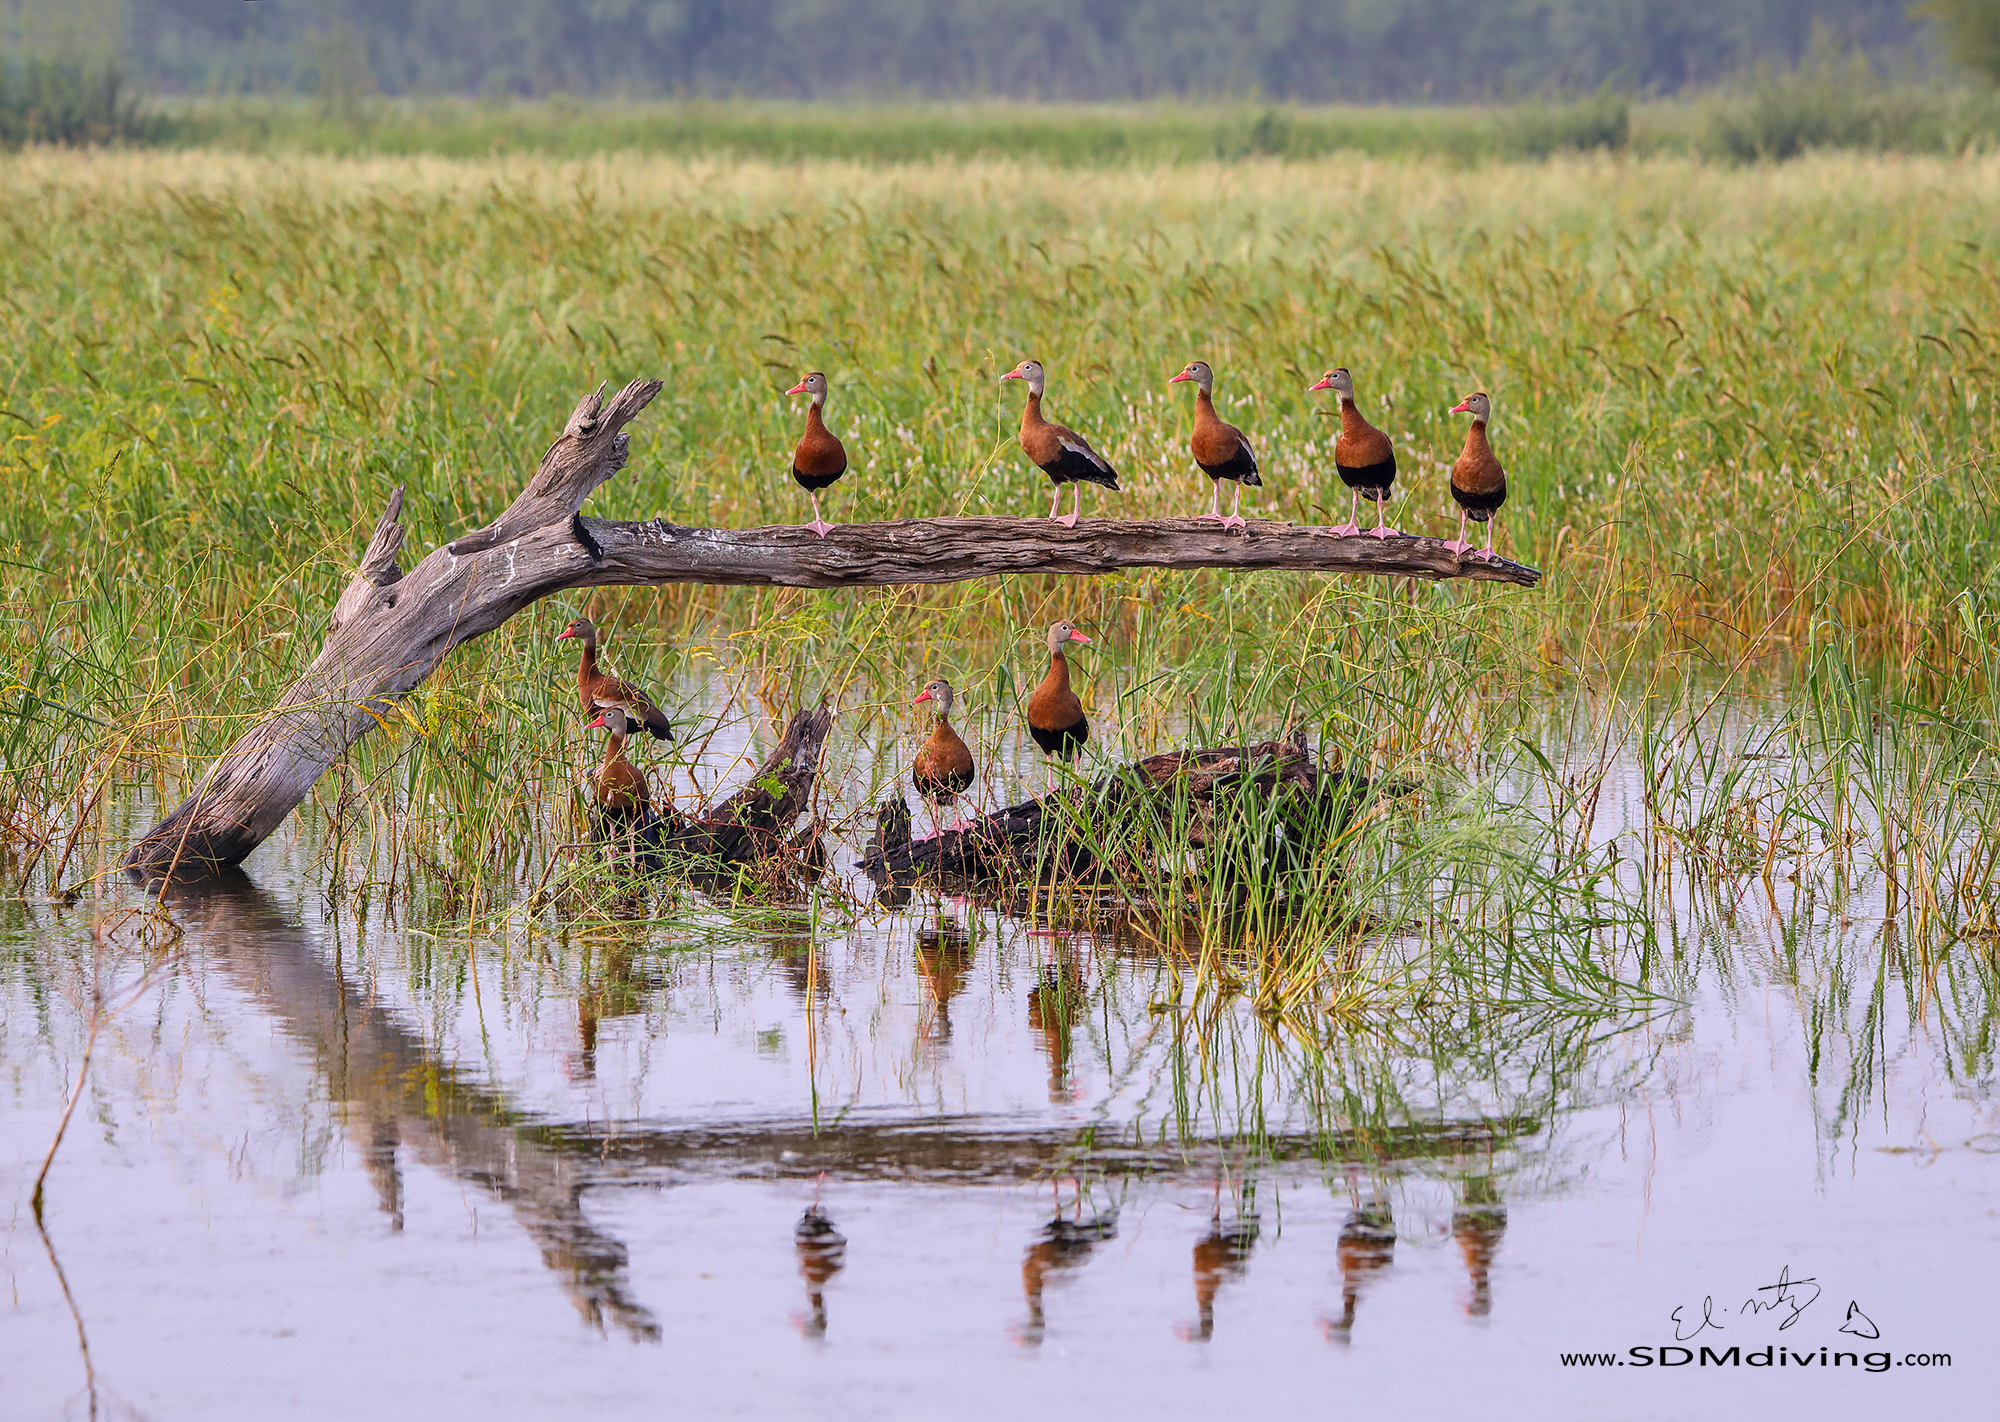 15. Black-bellied whistling ducks, off Santa Anna Wildlife Refuge, Alamo, Texas